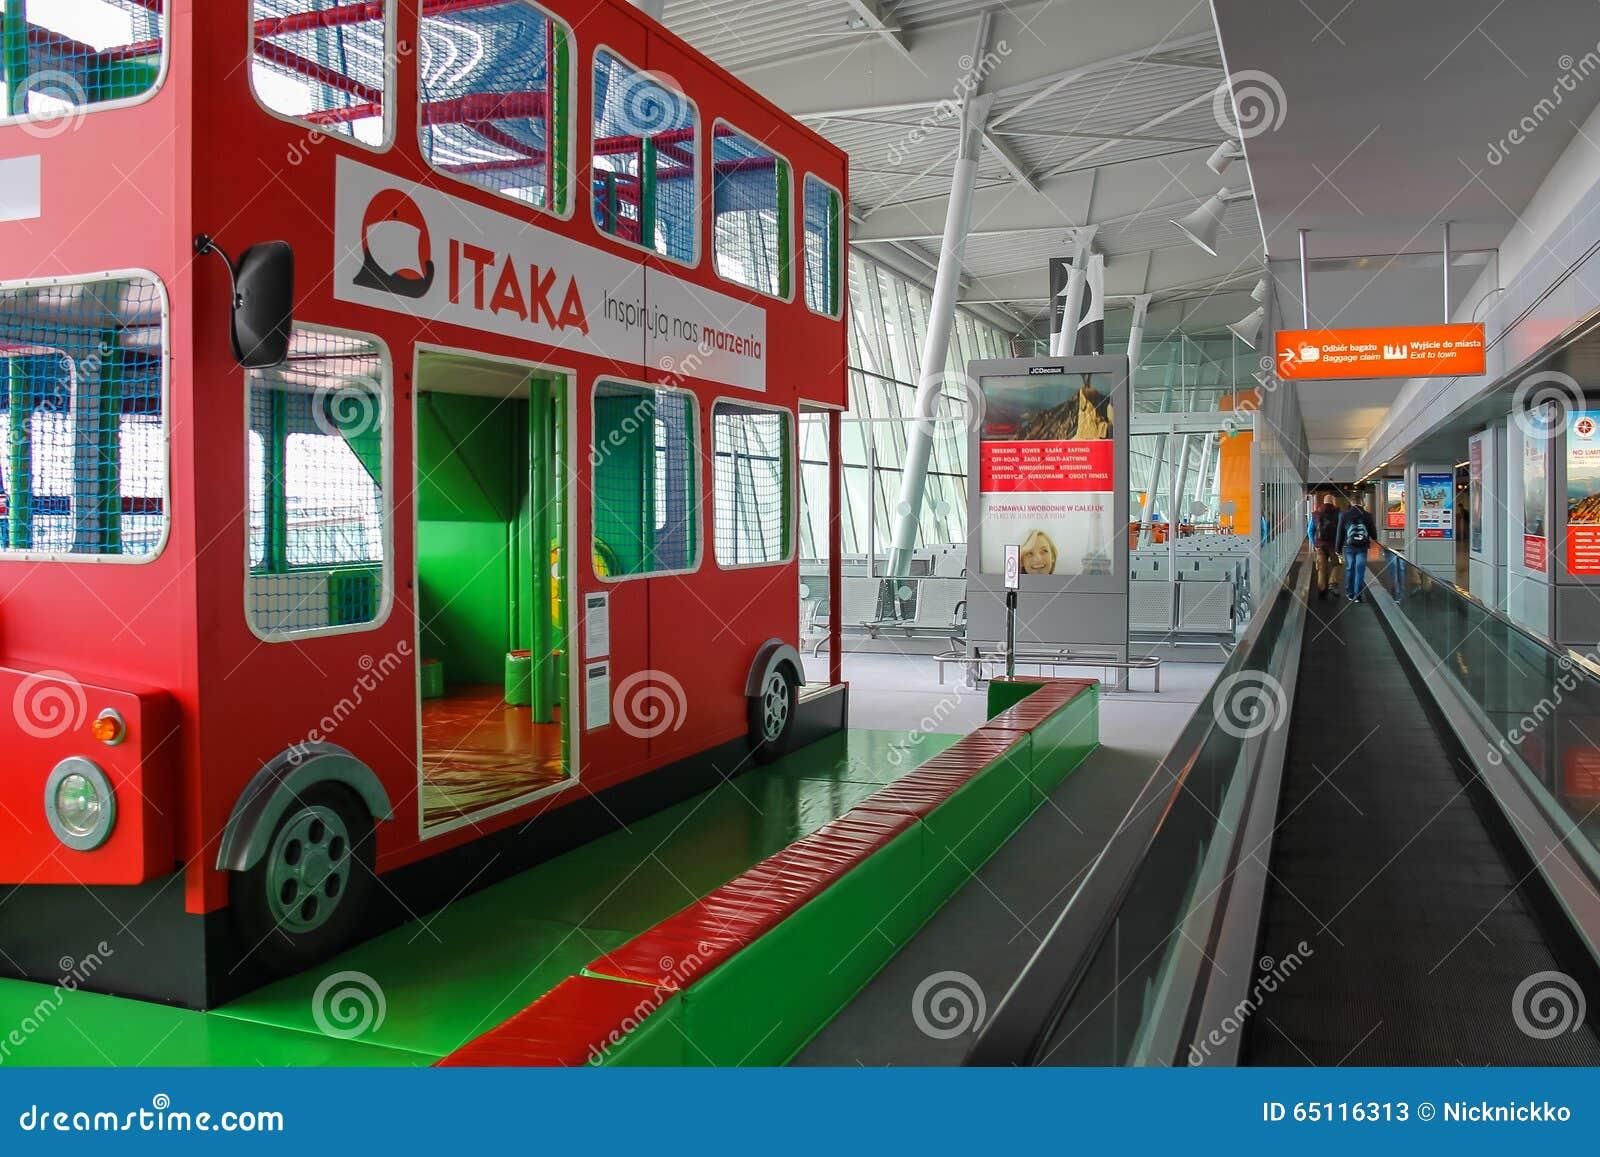 Aeroporto Waw : Kids playground bus in warsaw chopin airport poland editorial stock